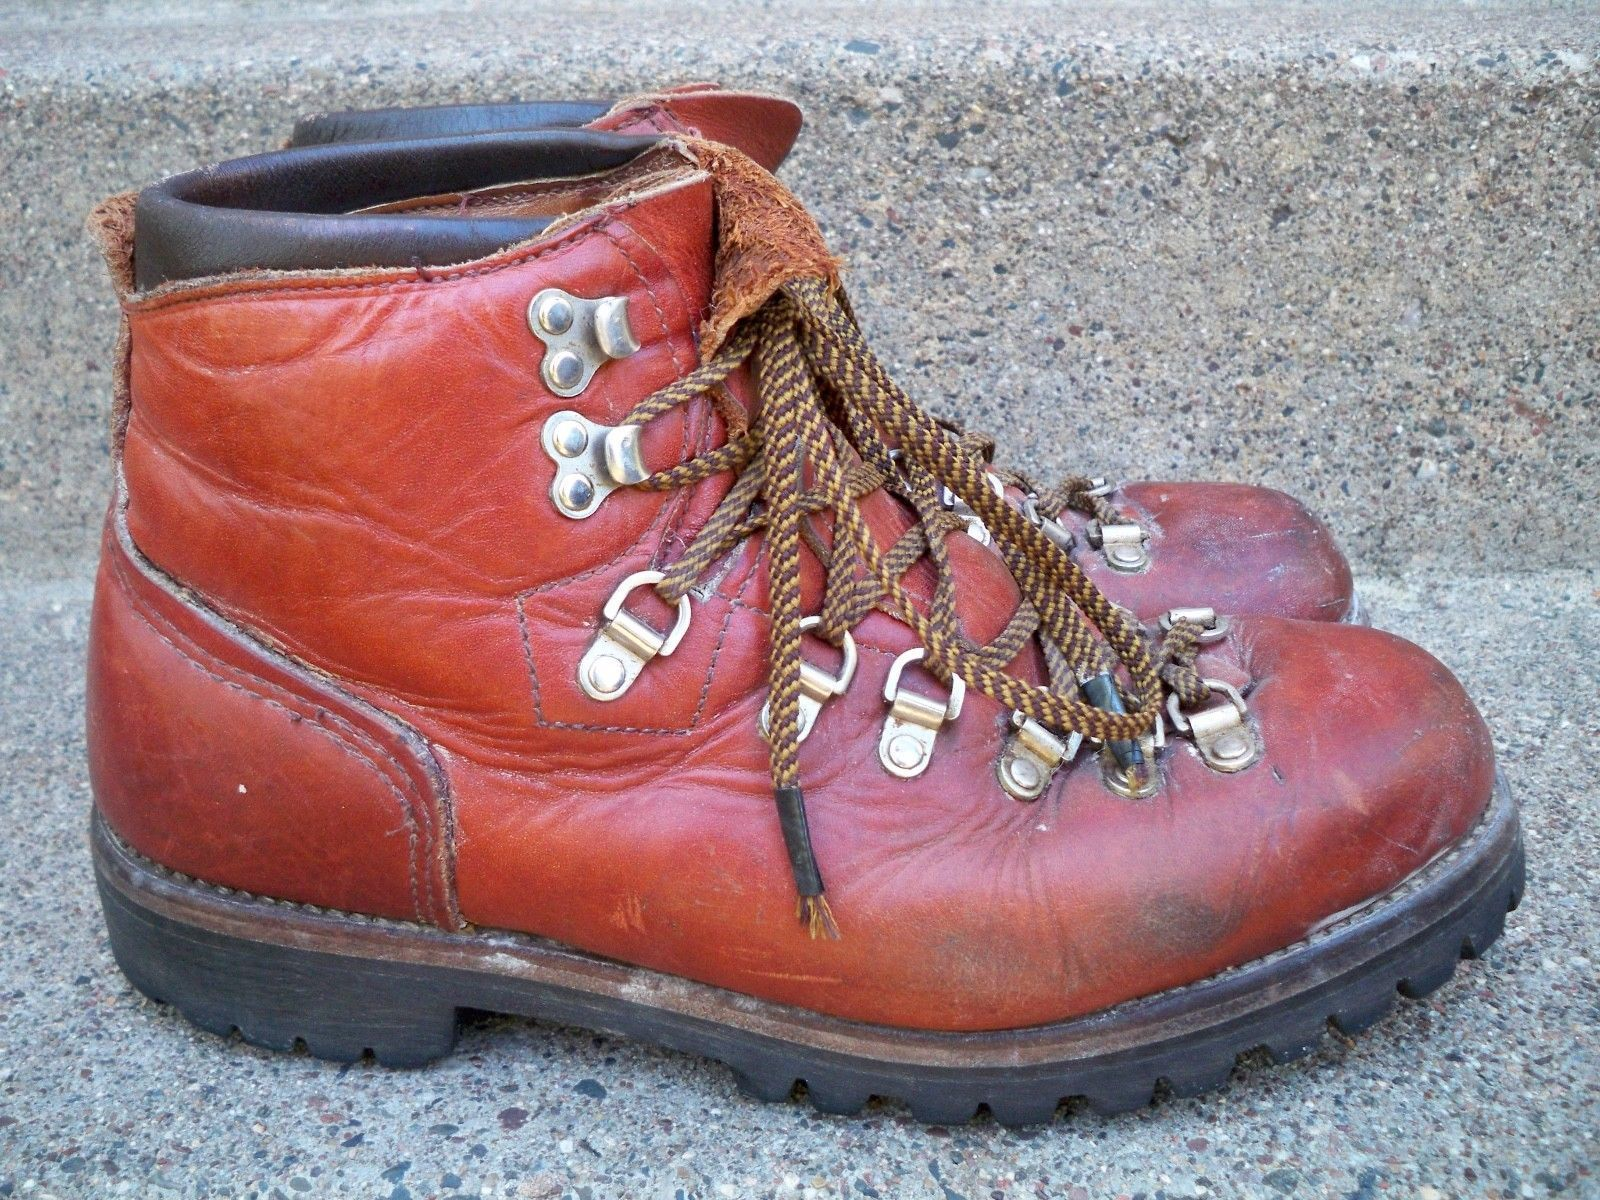 956668d3e58fc Vintage Red Wing Irish Setter Mountaineering Hiking Stomper Men's ...